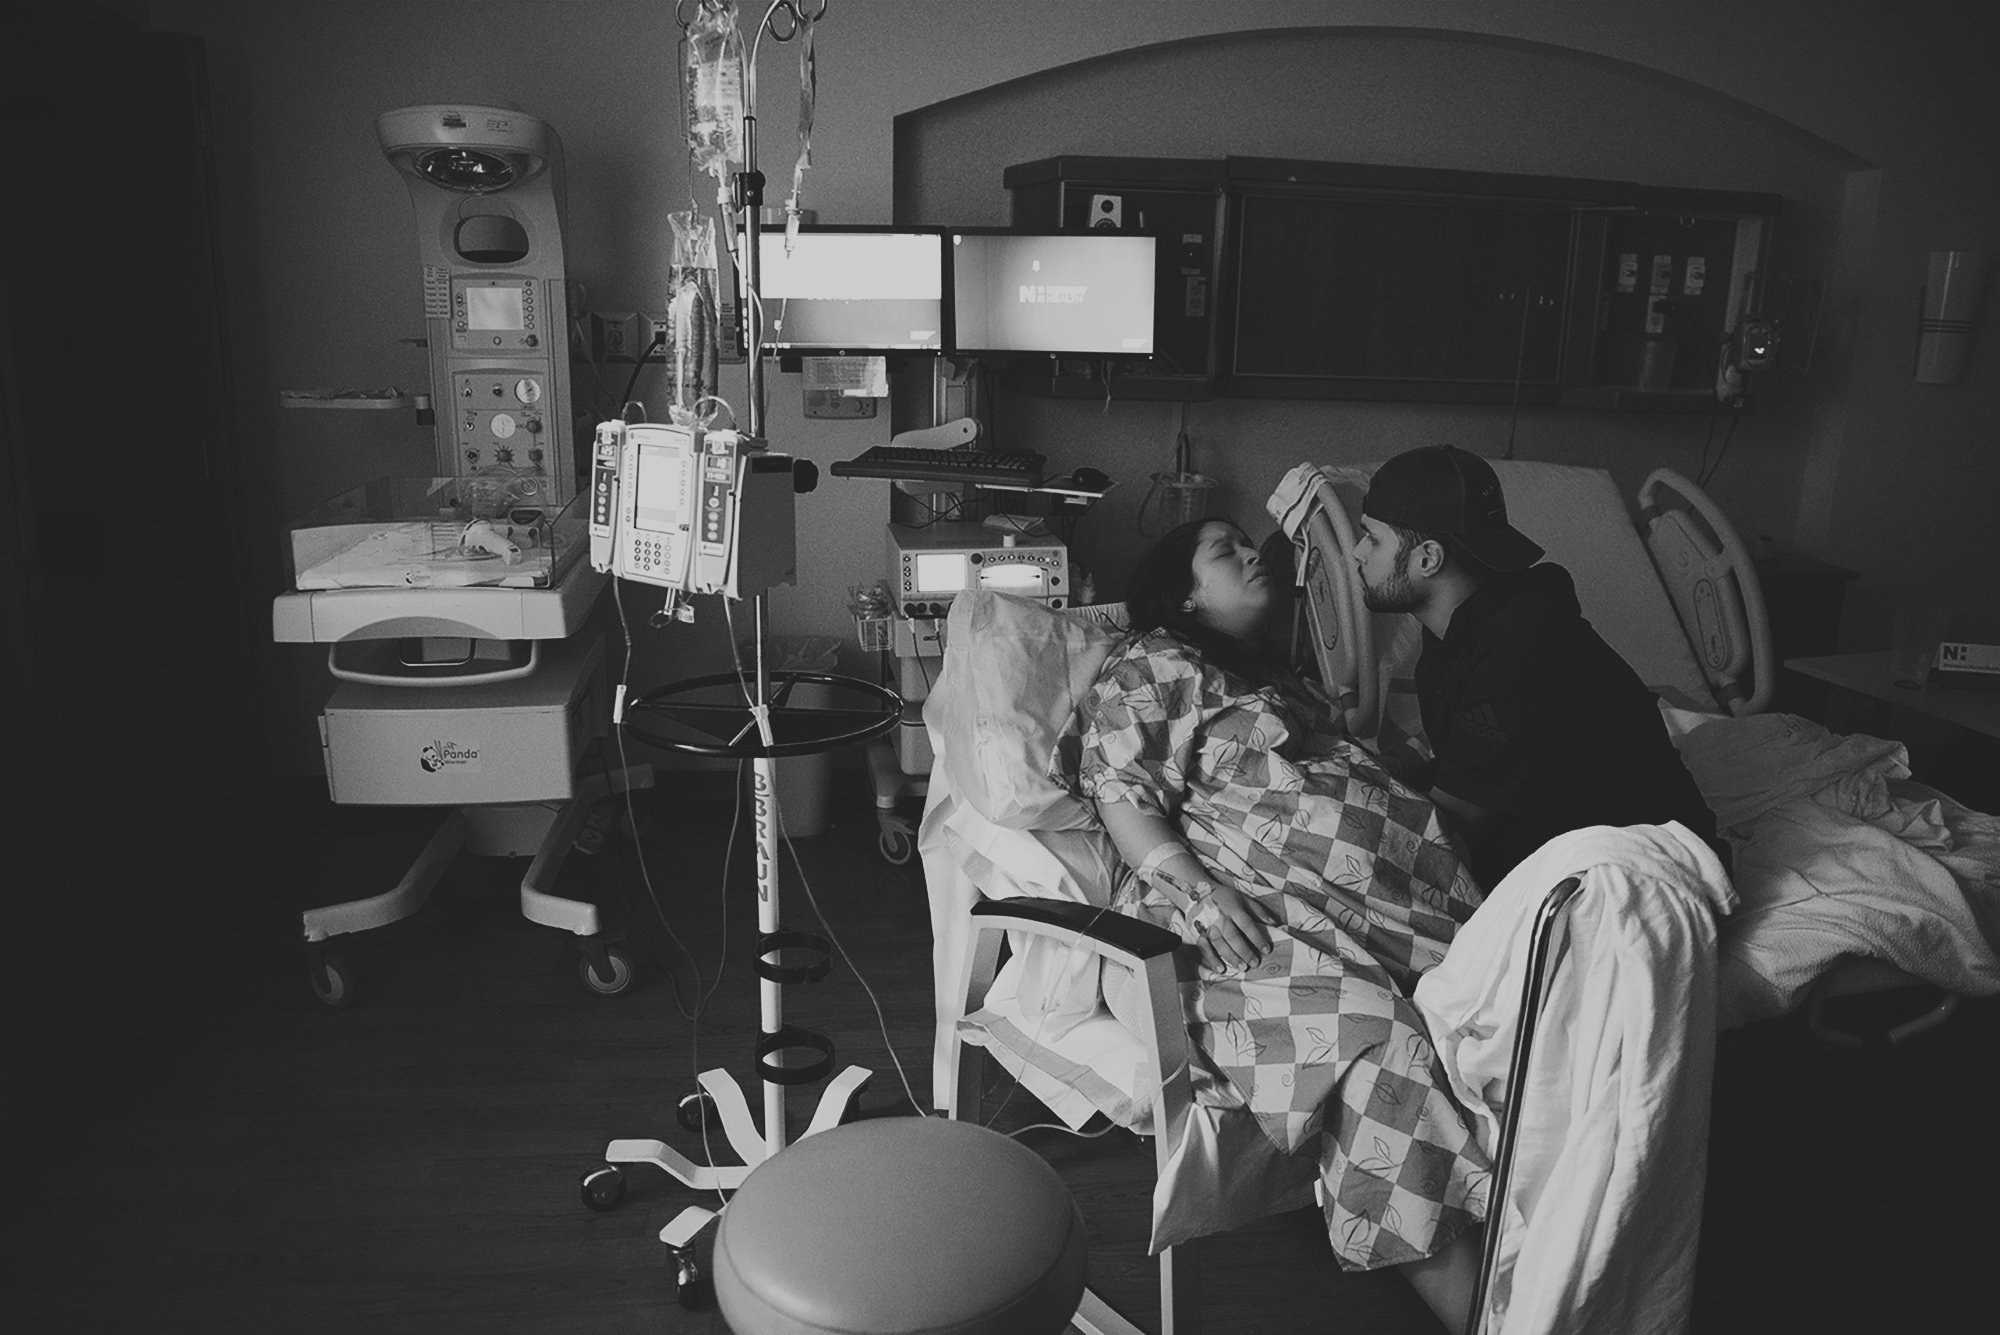 Hospital - 15